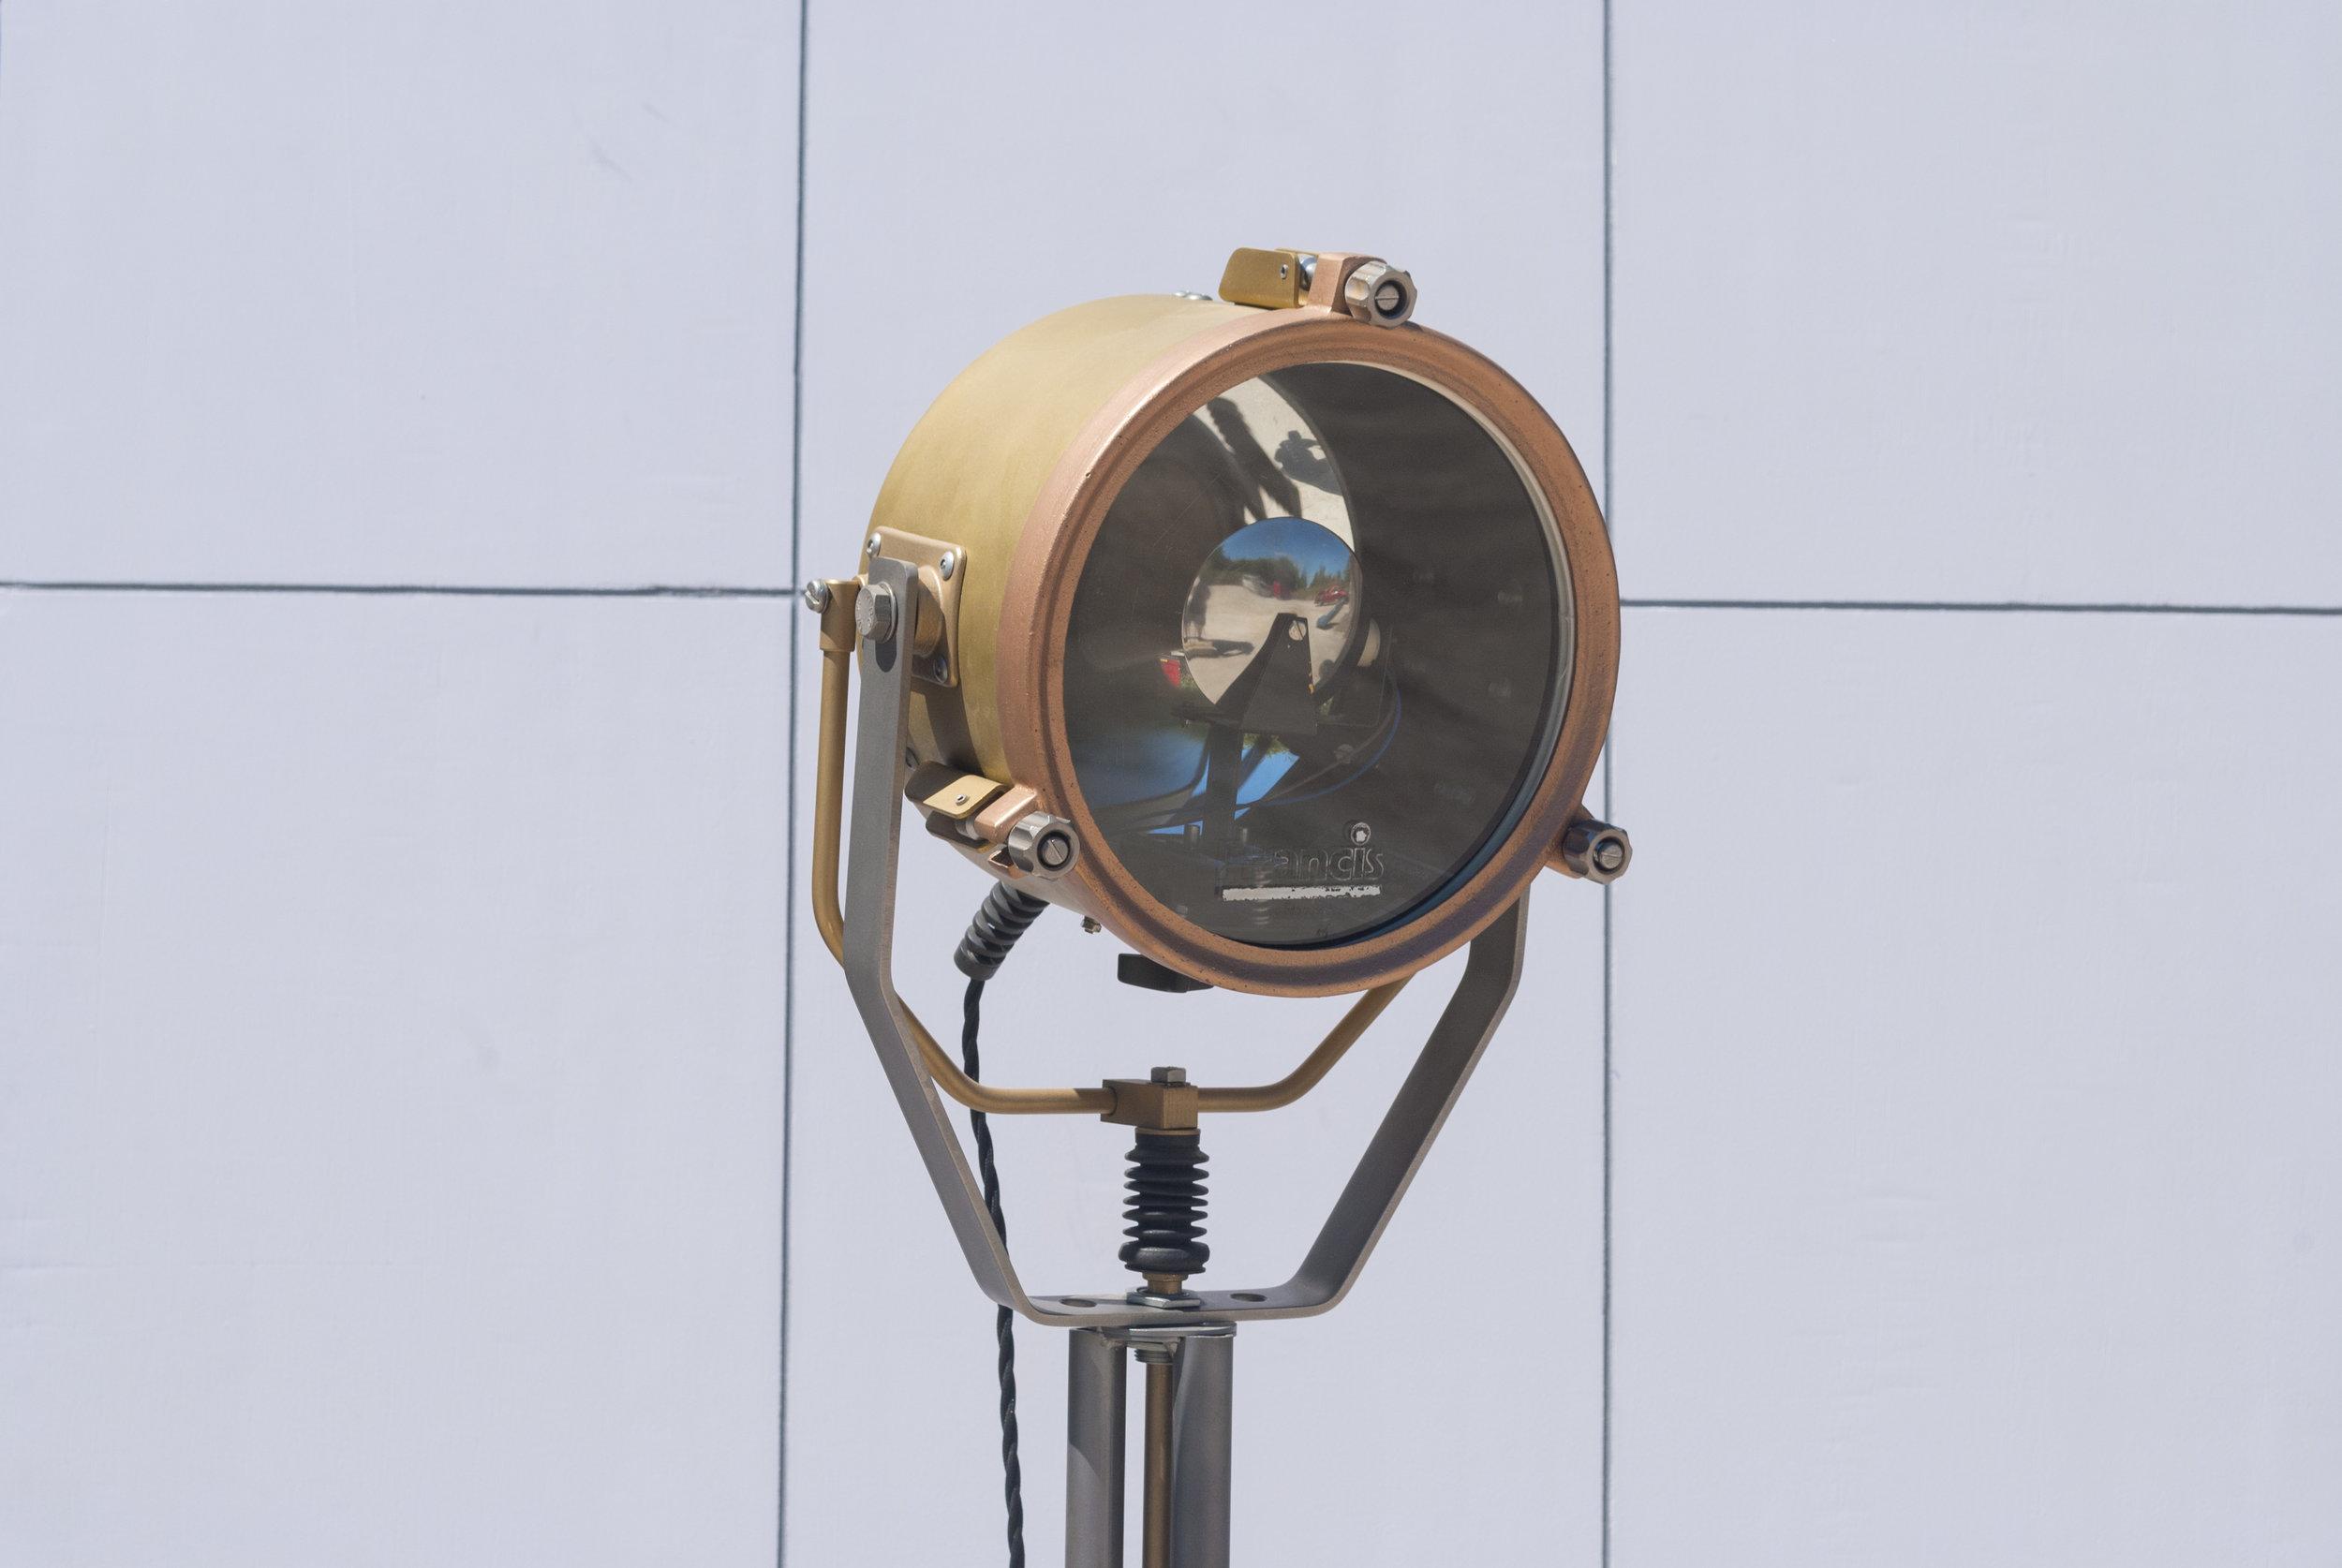 brass sach lamp close up.jpg